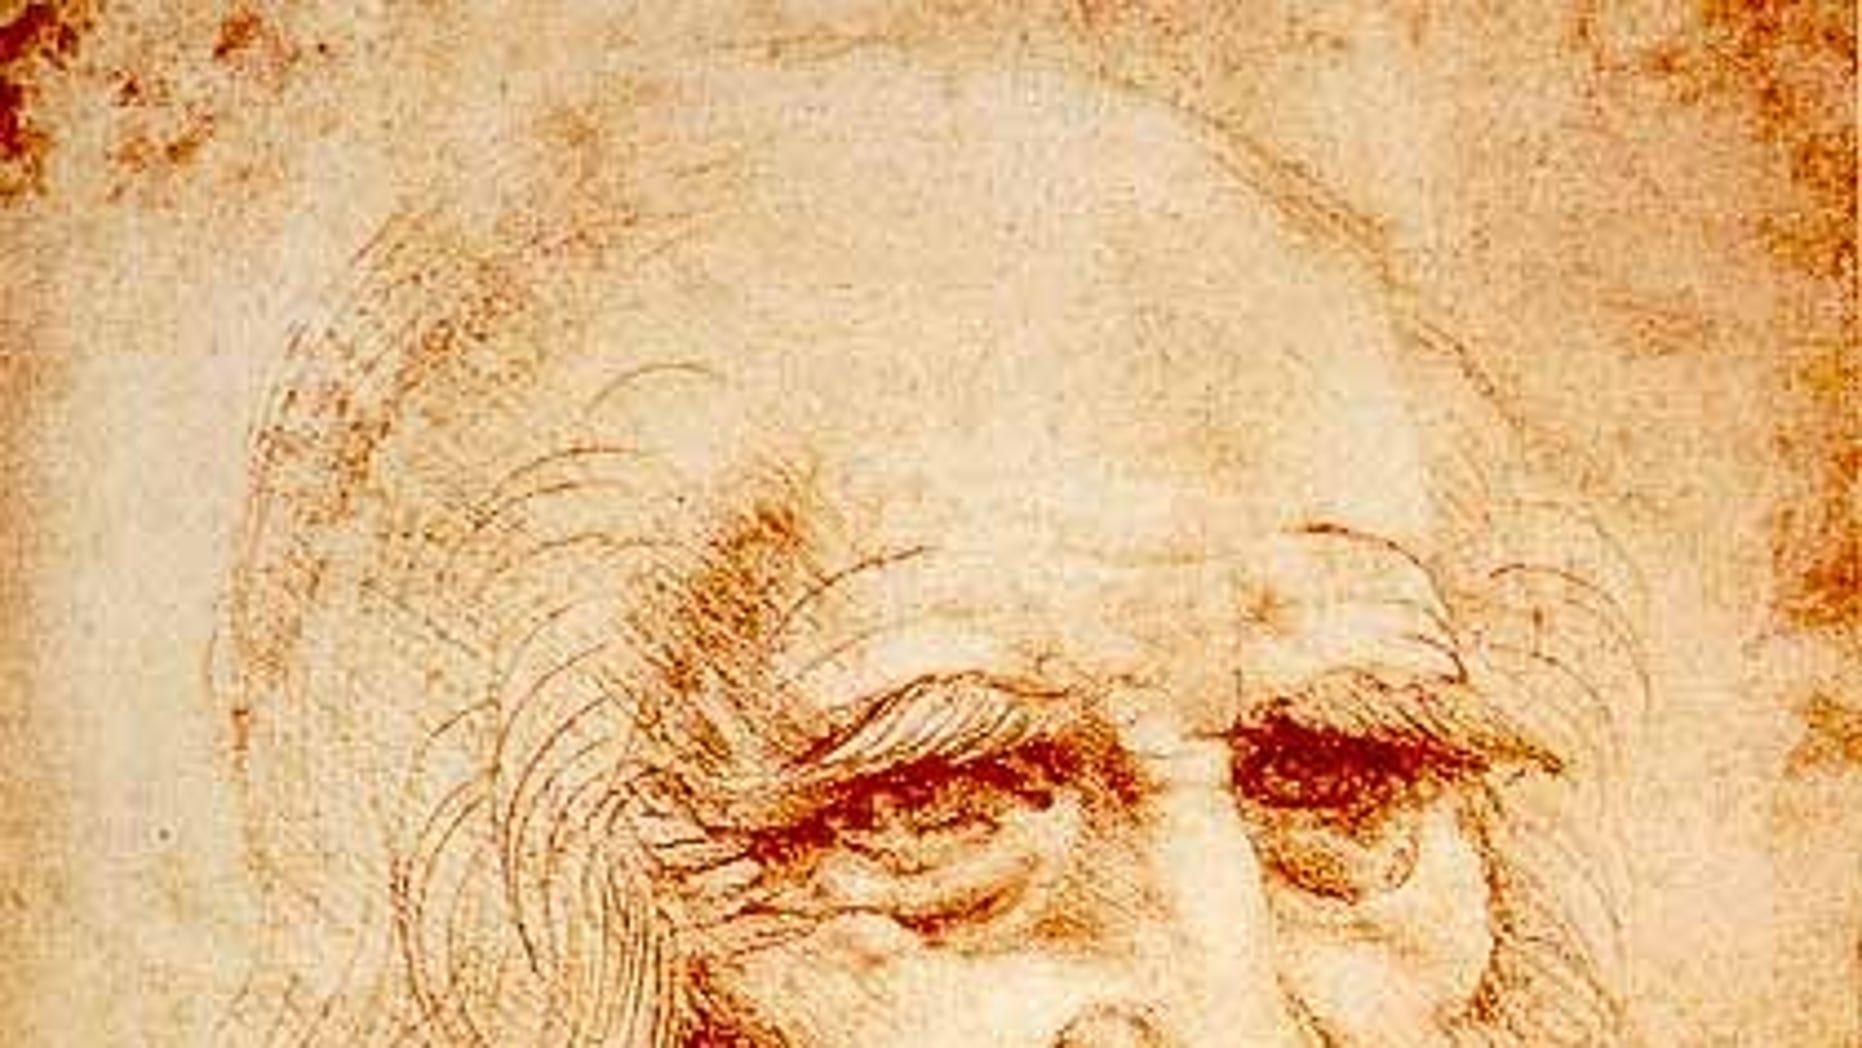 A self-portrait of Leonardo da Vinci done in red chalk.